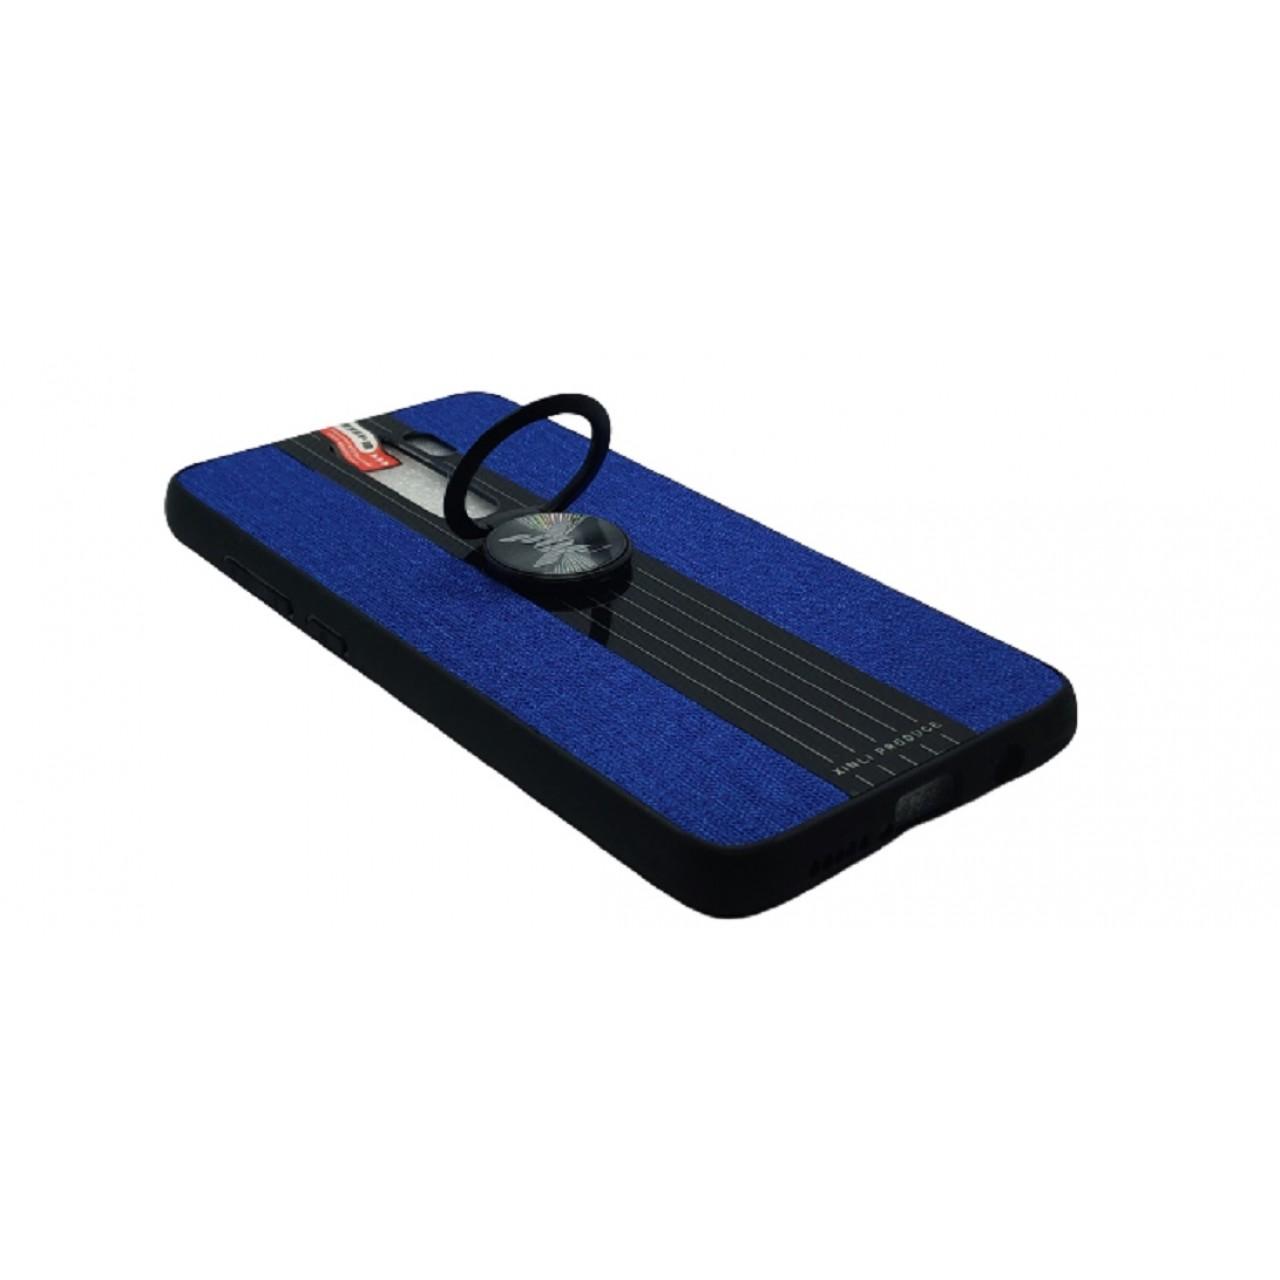 Back Case Cloth Pattern with ring for Redmi note 8 PRO Blue - Θήκη προστασίας με δαχτυλίδι στην πλάτη Μπλε - OEM